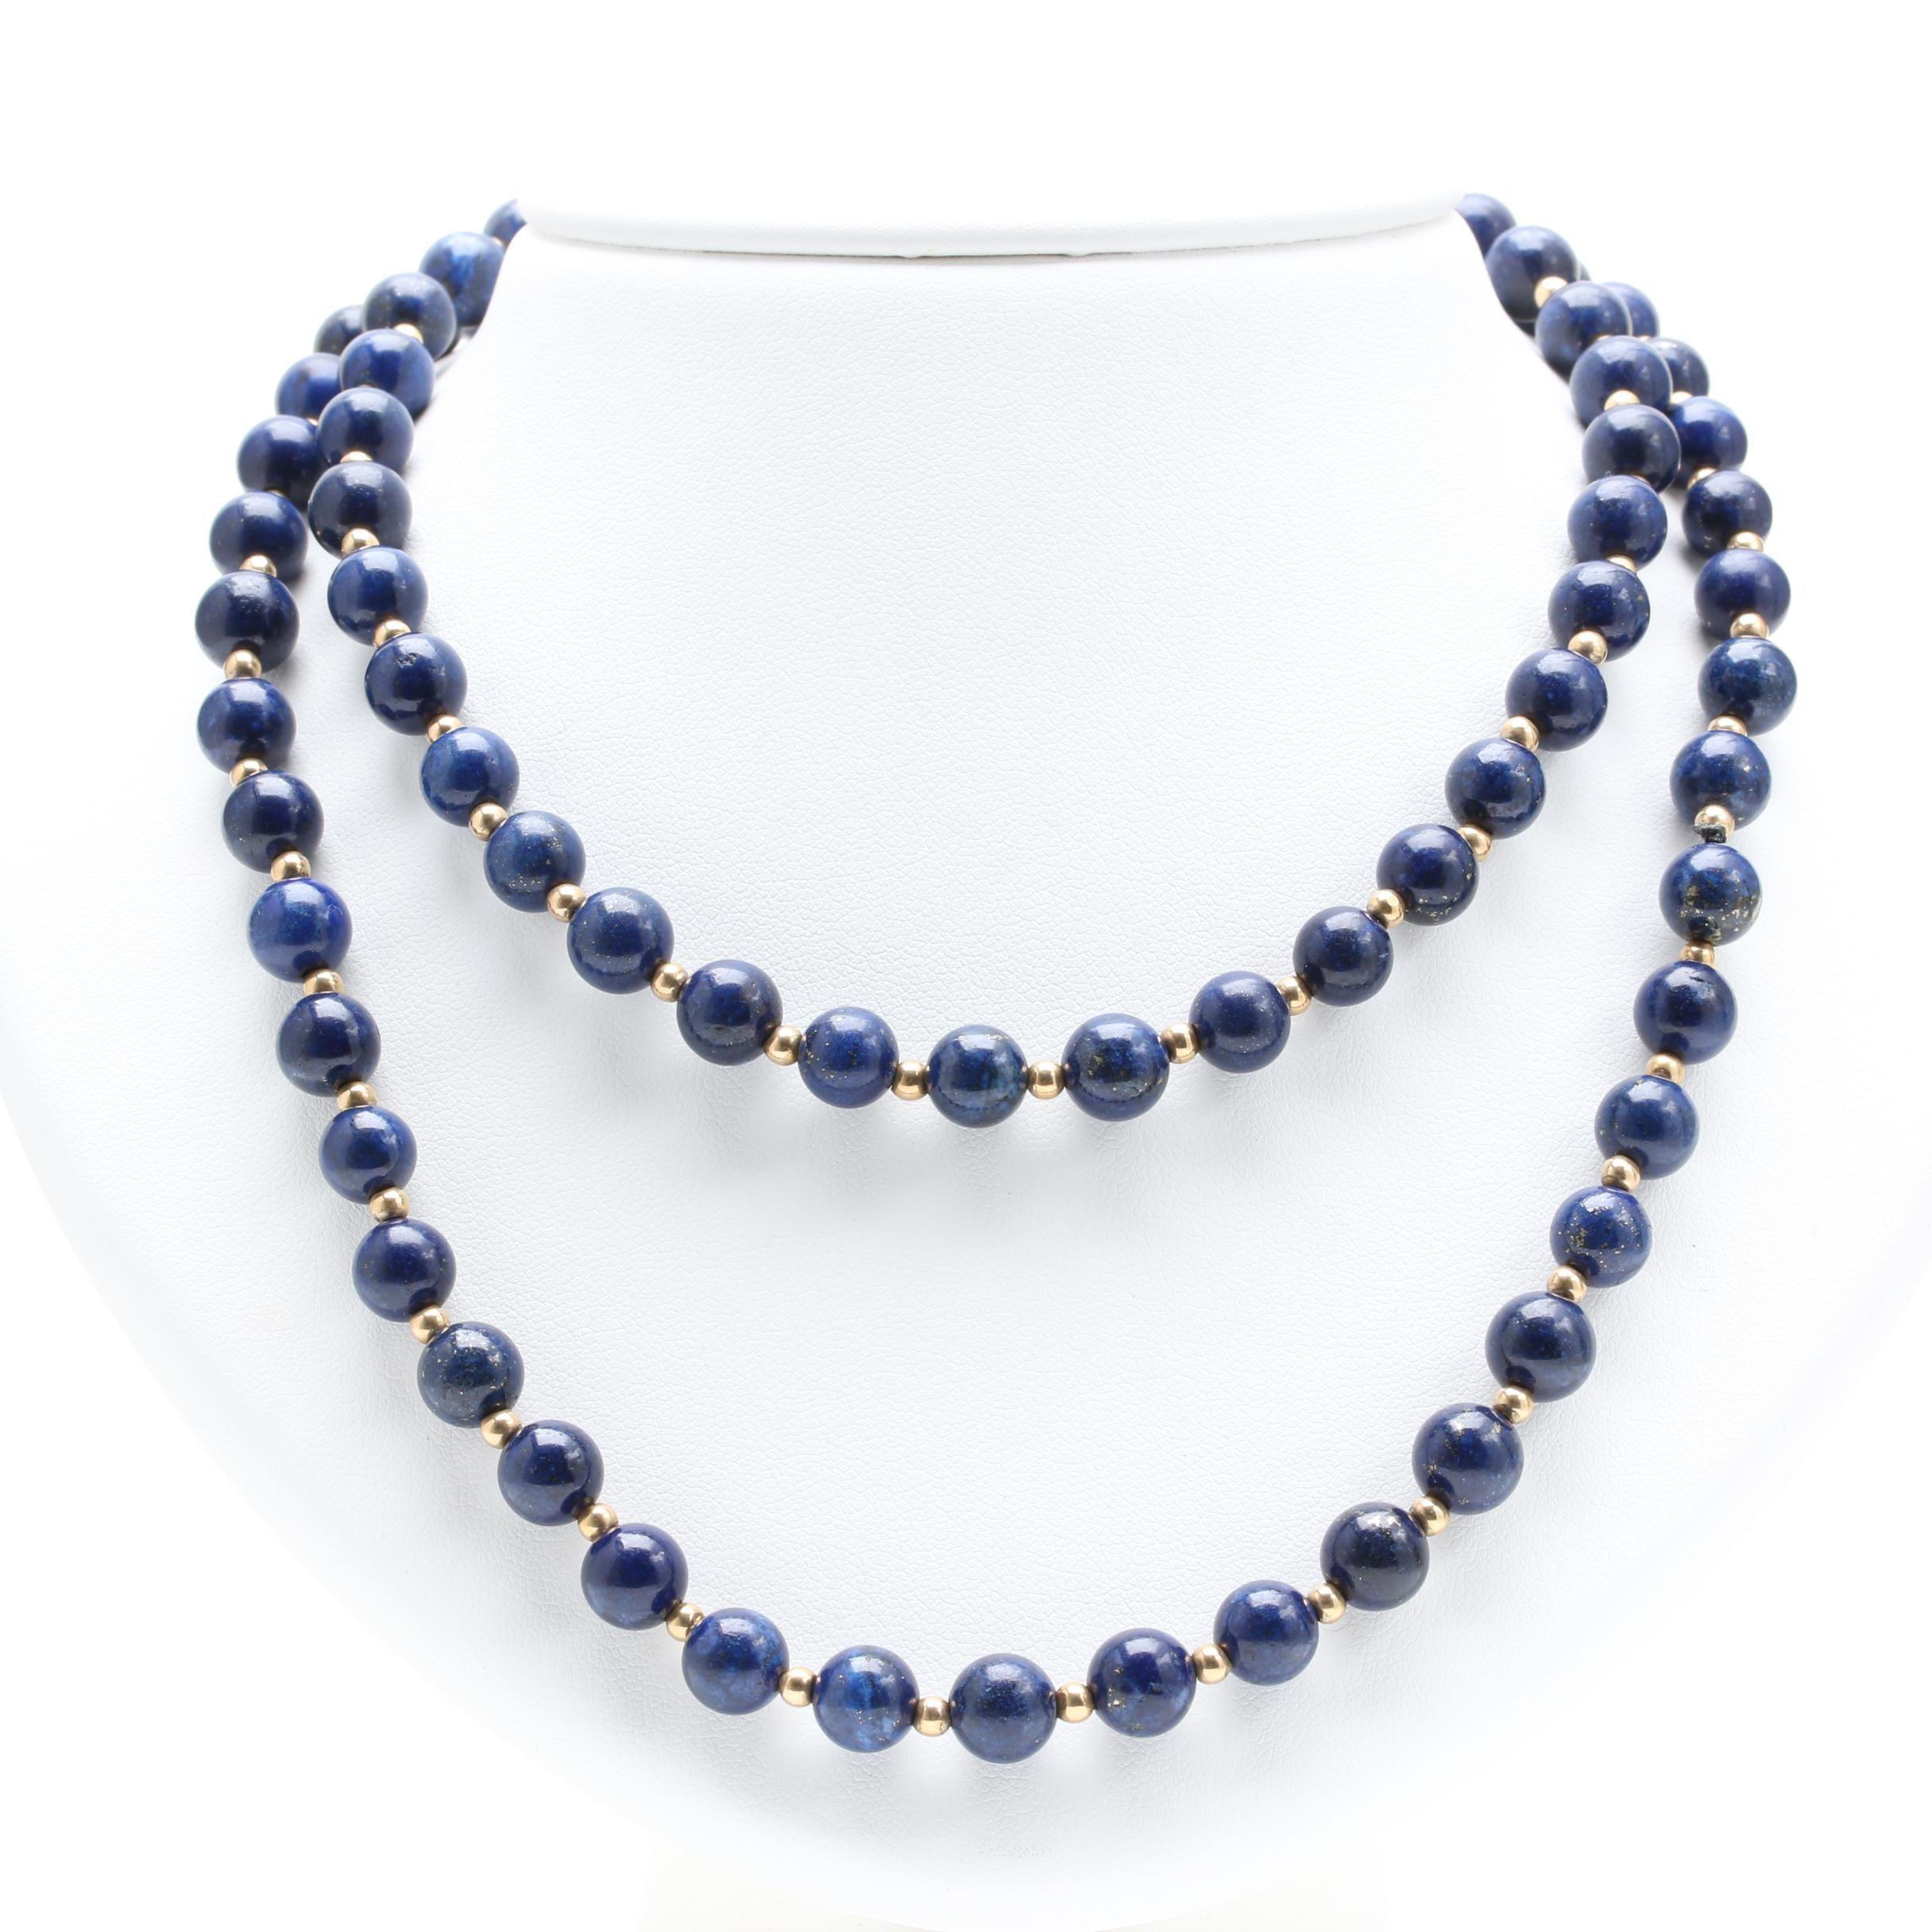 14K Yellow Gold Lapis Lazuli Necklace